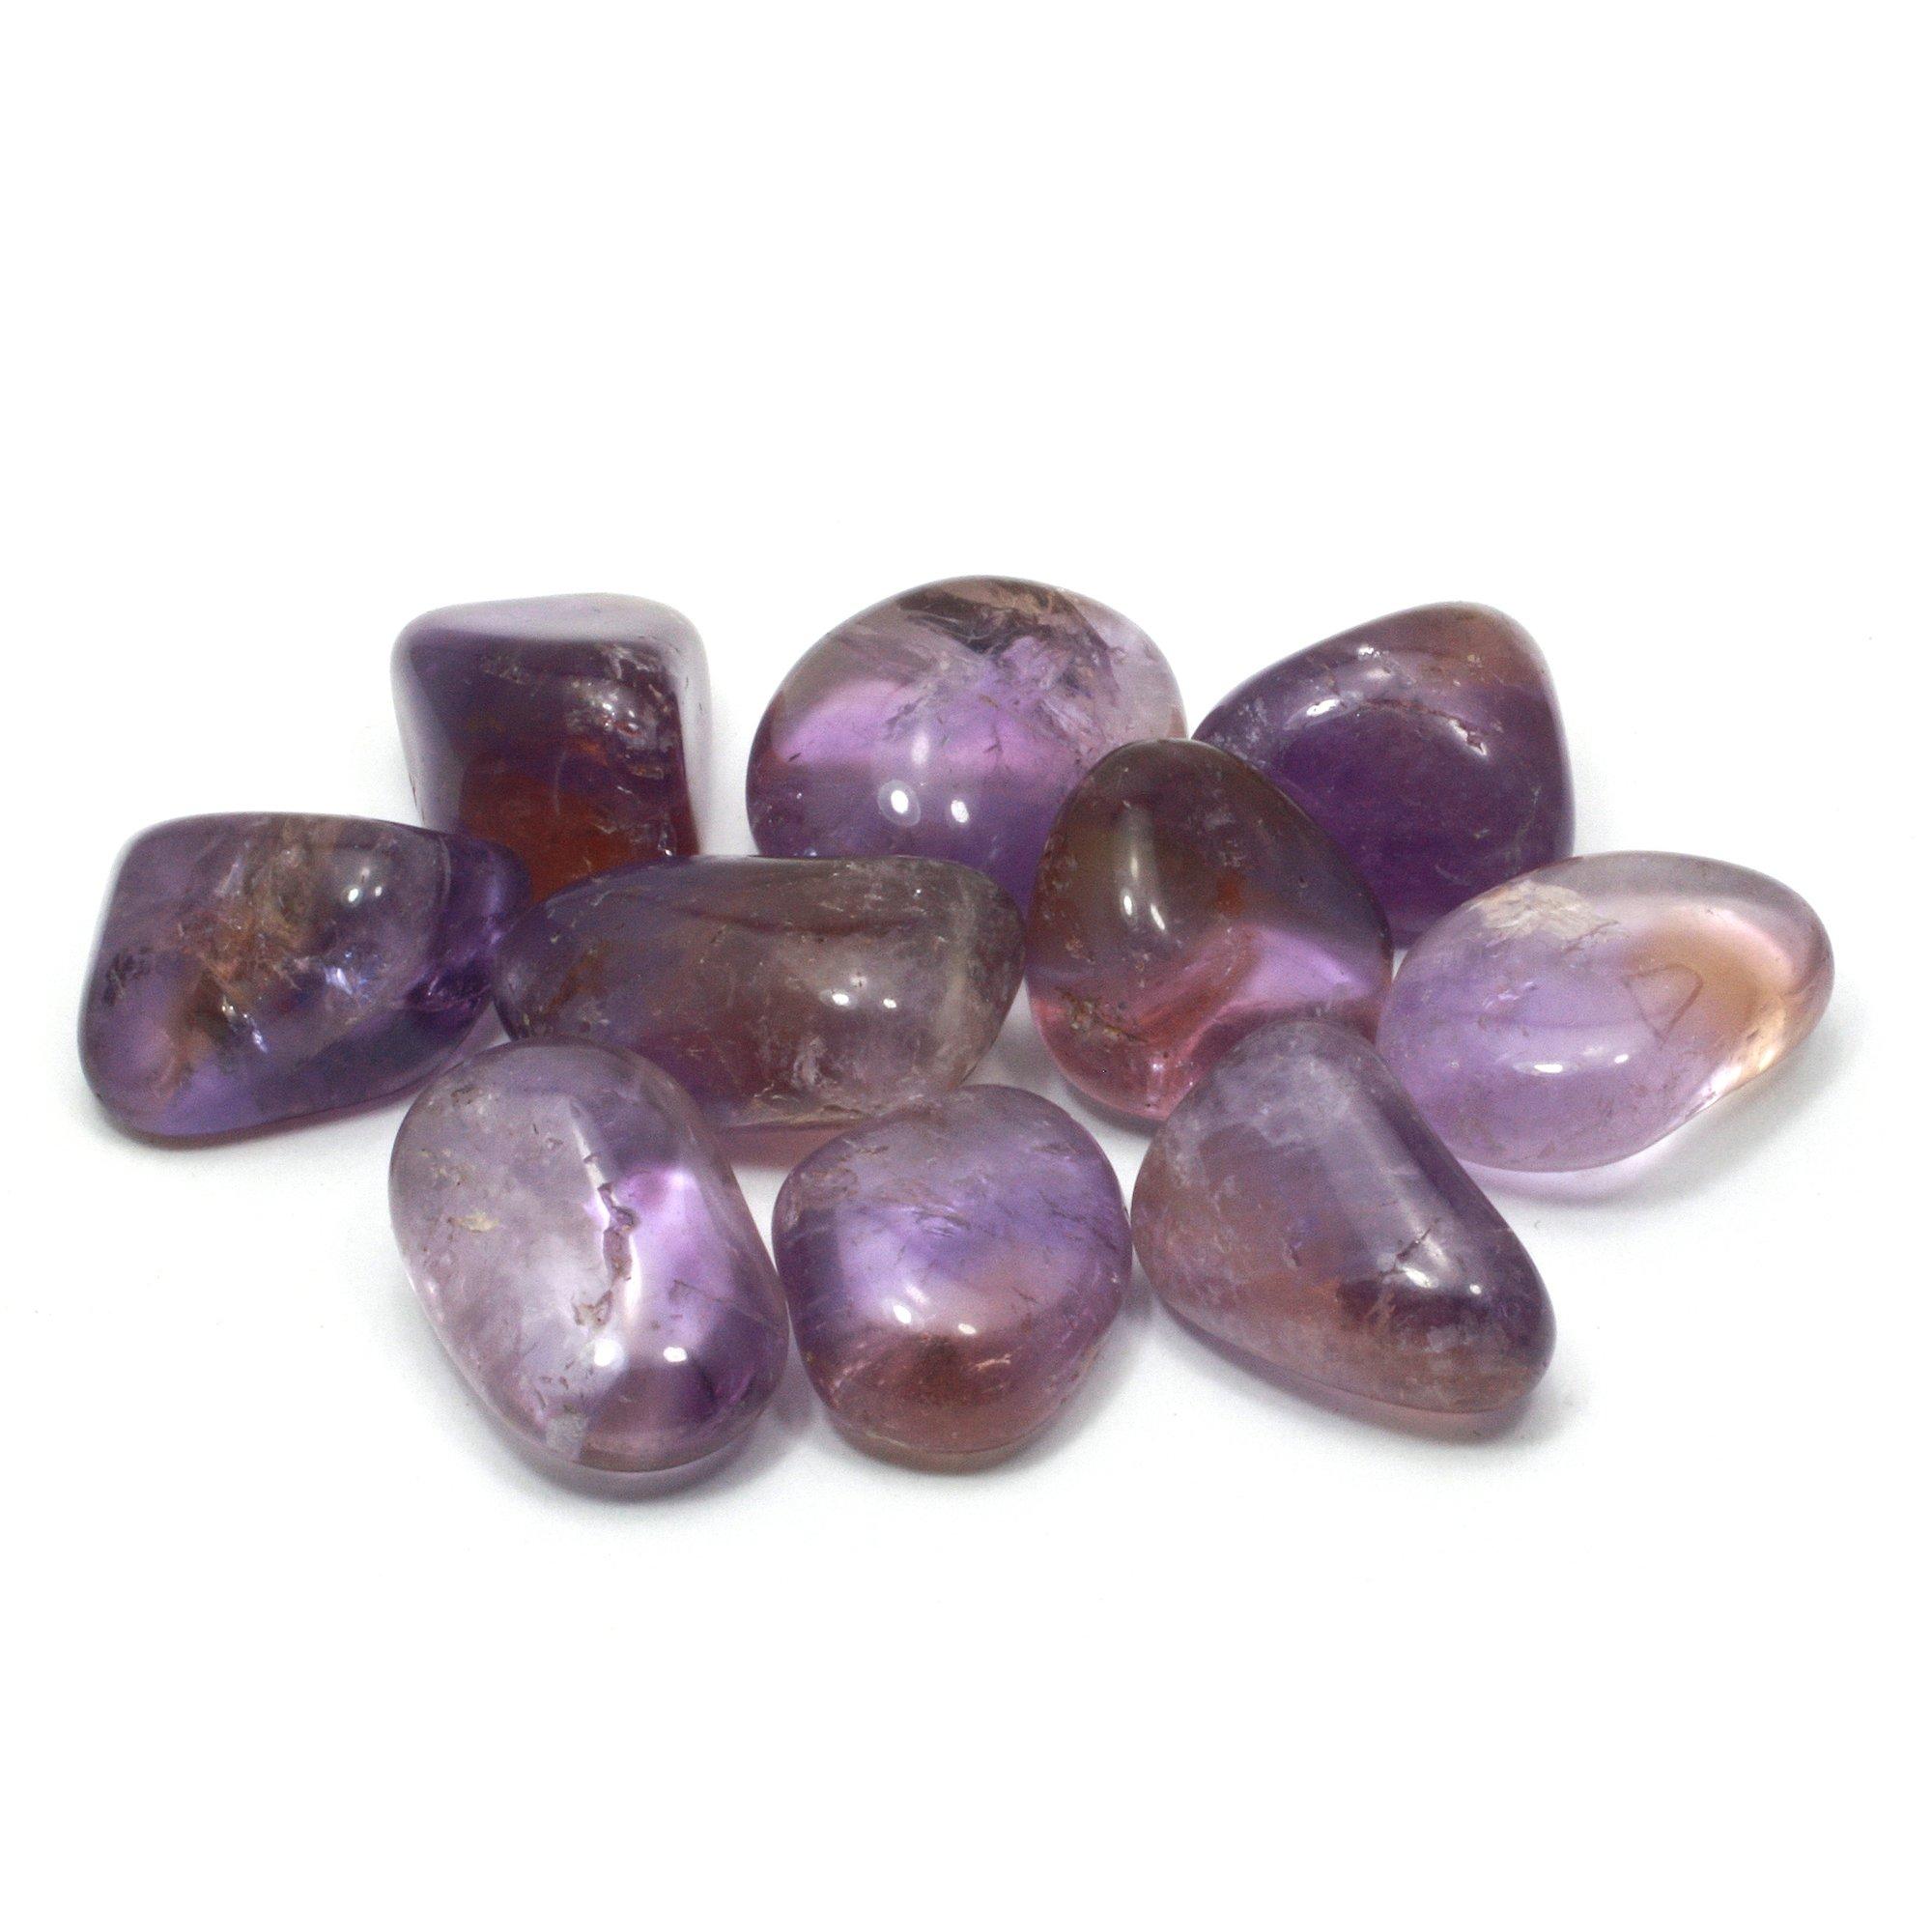 Ametrine Tumble Stone 20 25mm